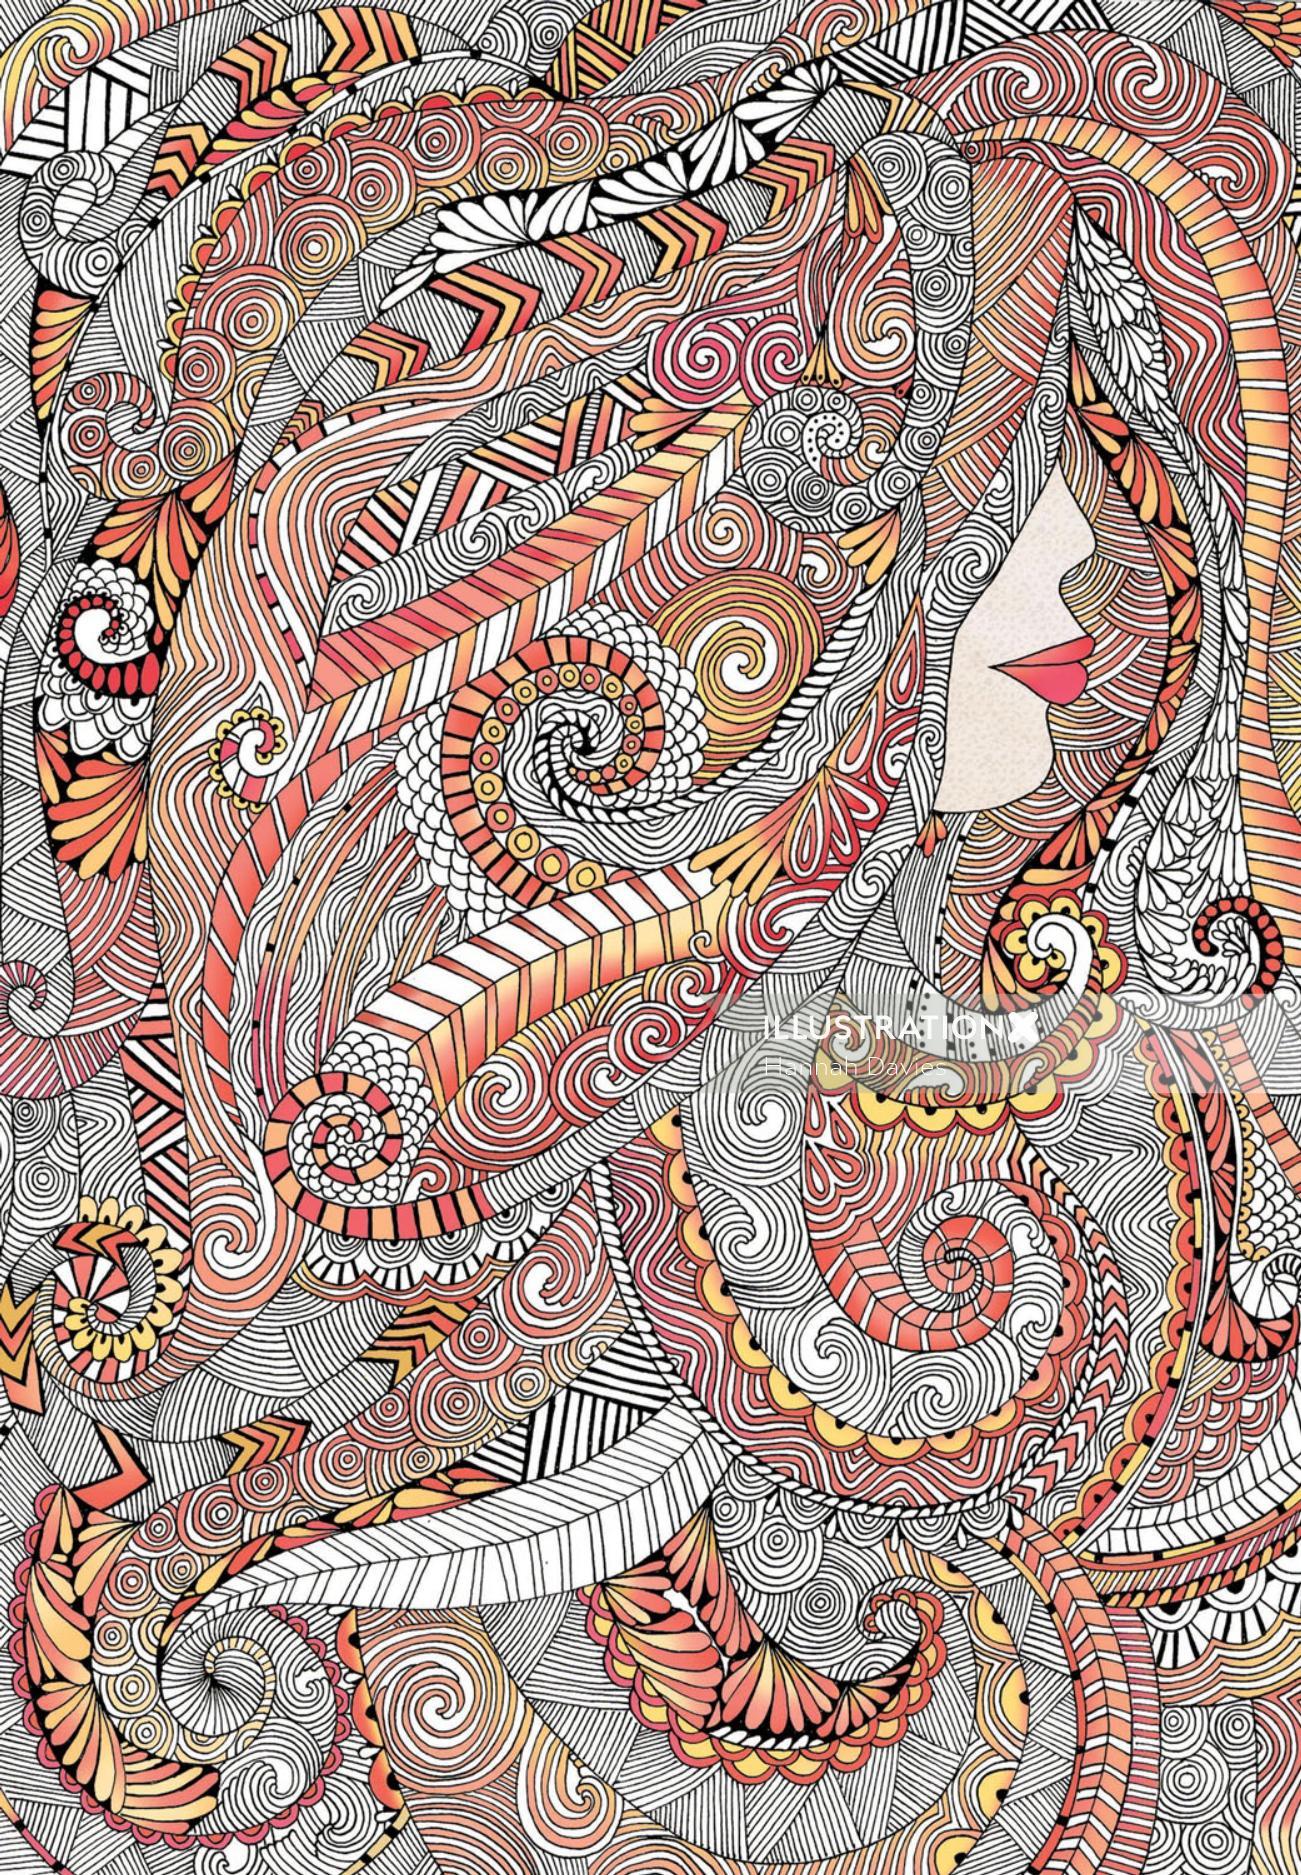 Hair and Beauty - An illustration by Hannah Davies